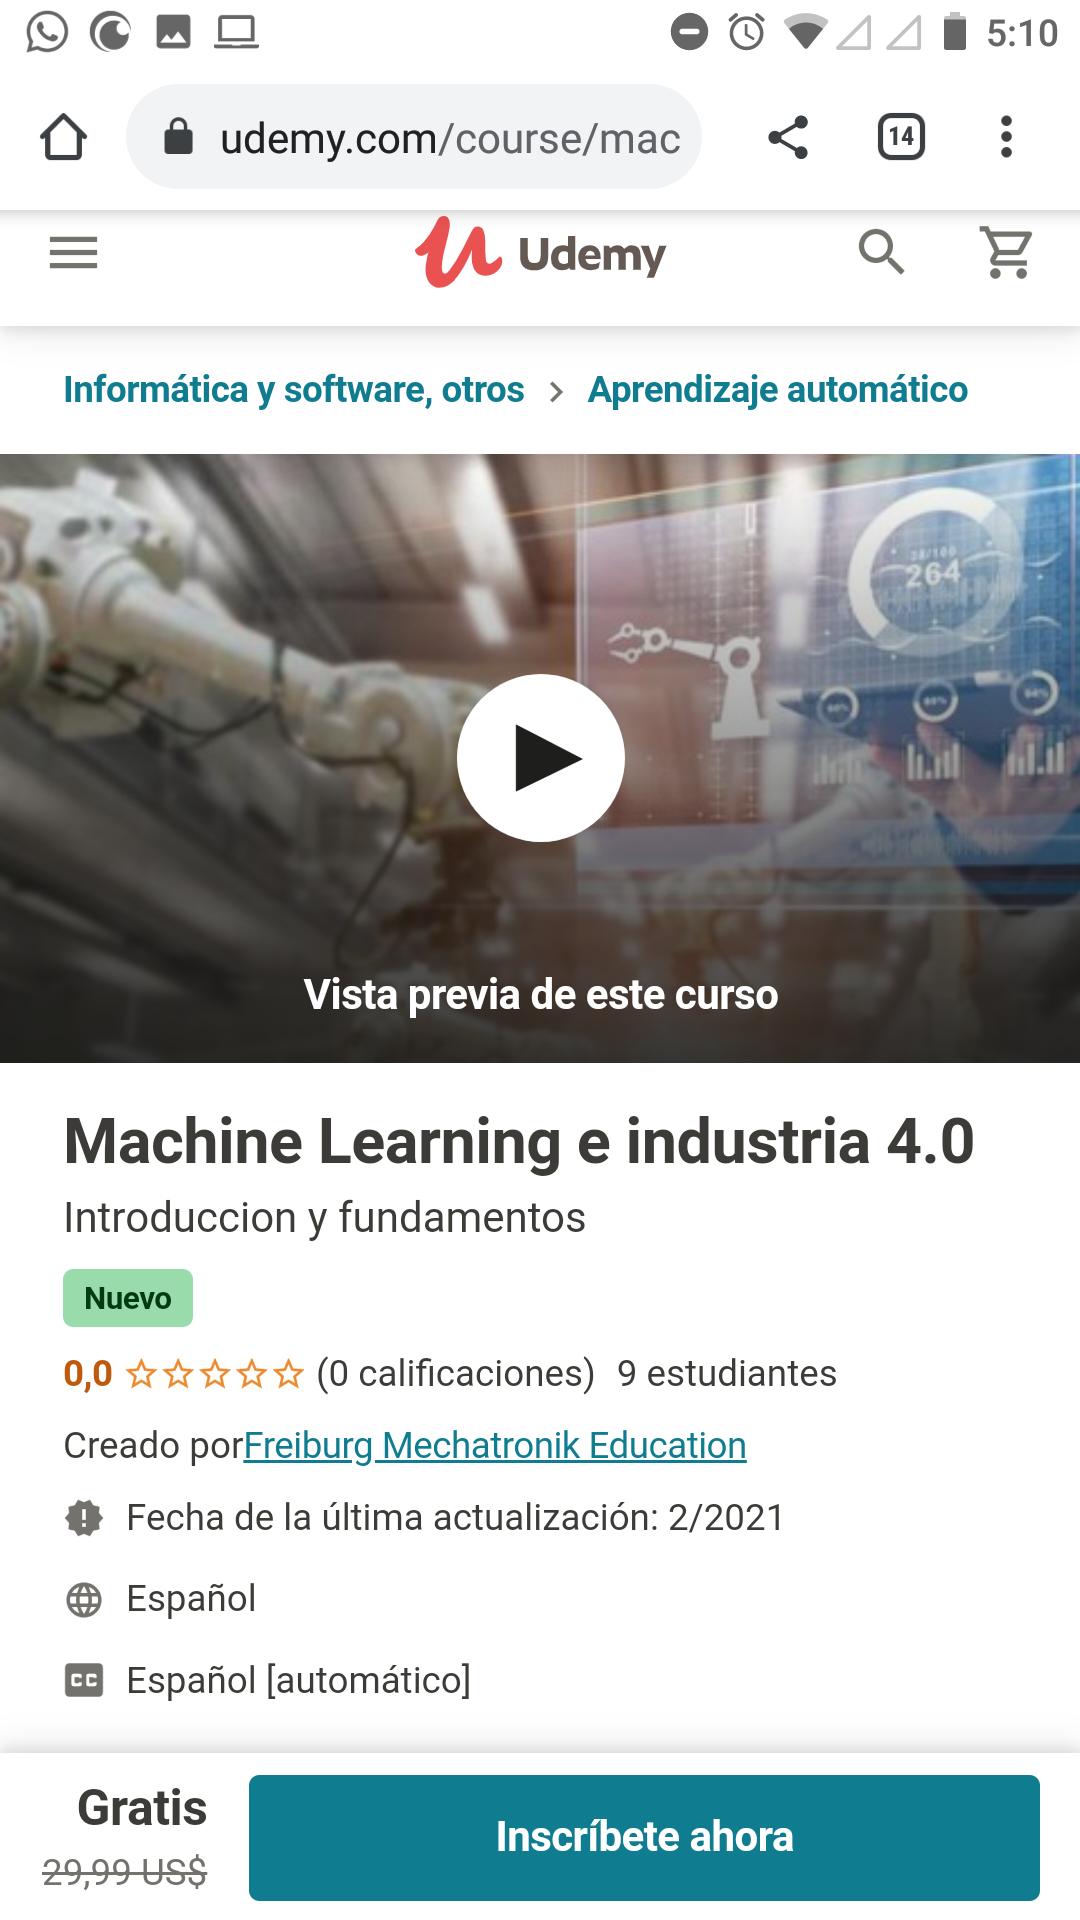 Udemy: Machine Learning e industria 4.0